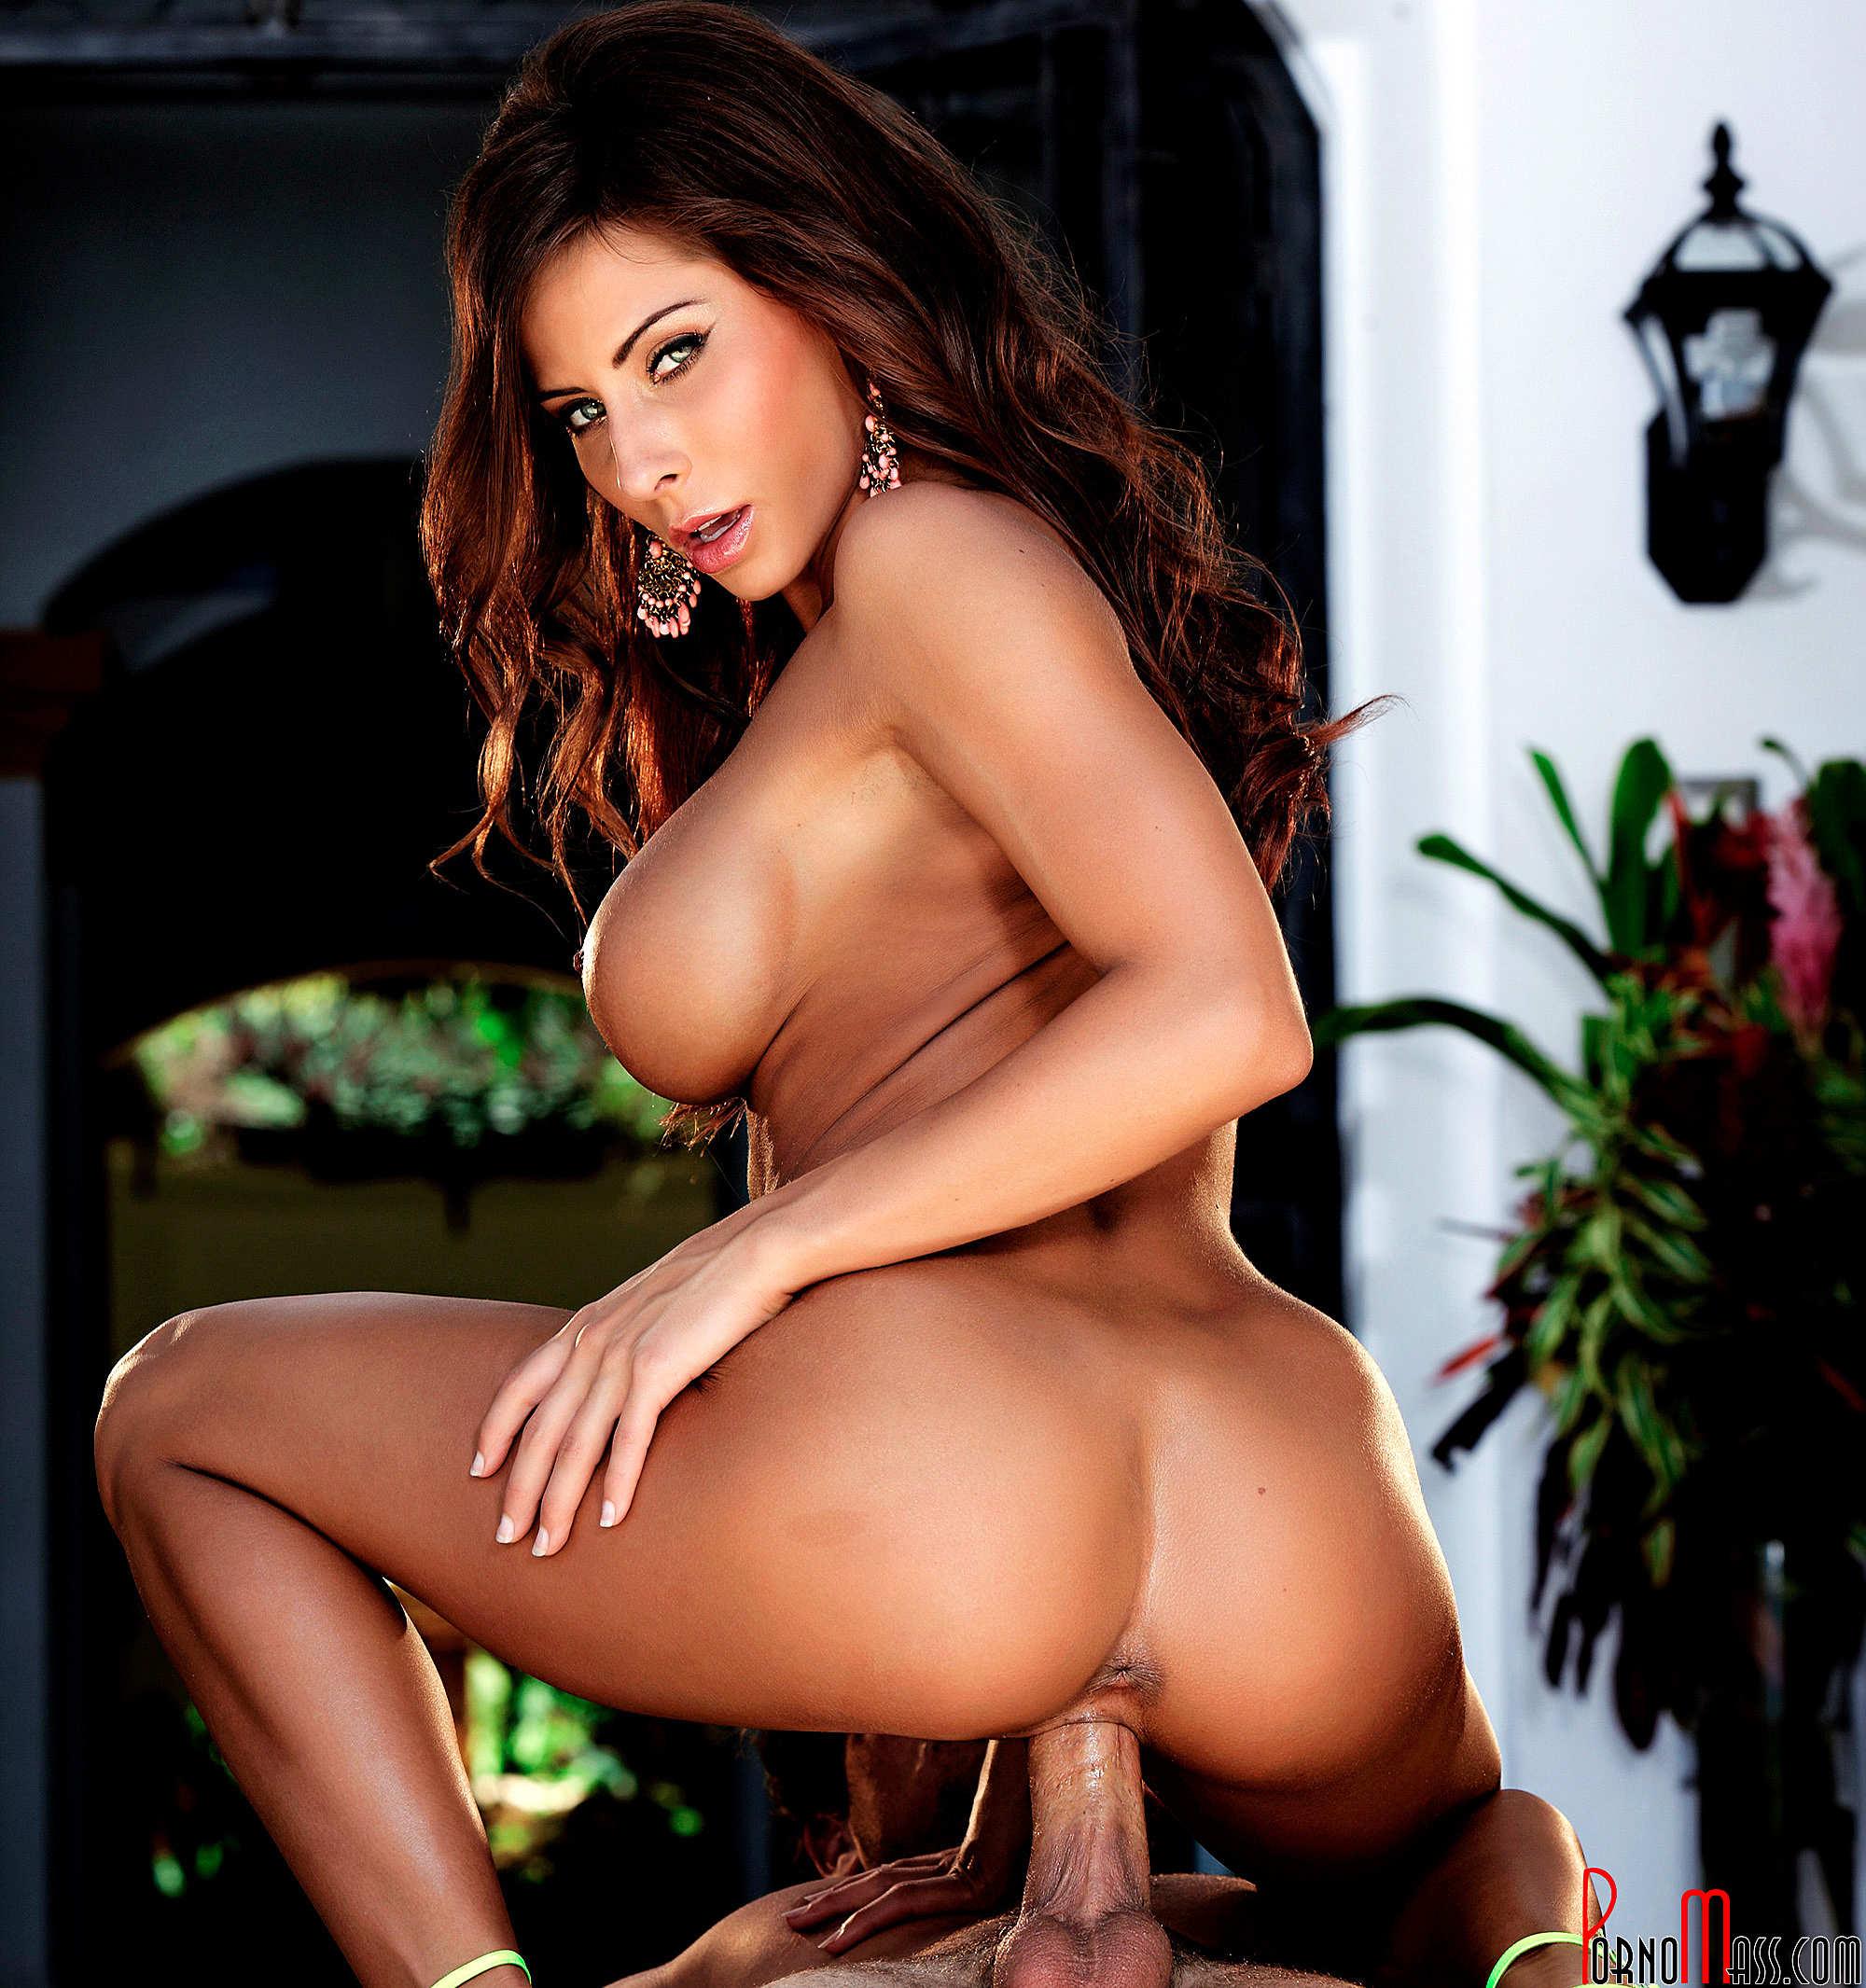 Porno Photos Page 1